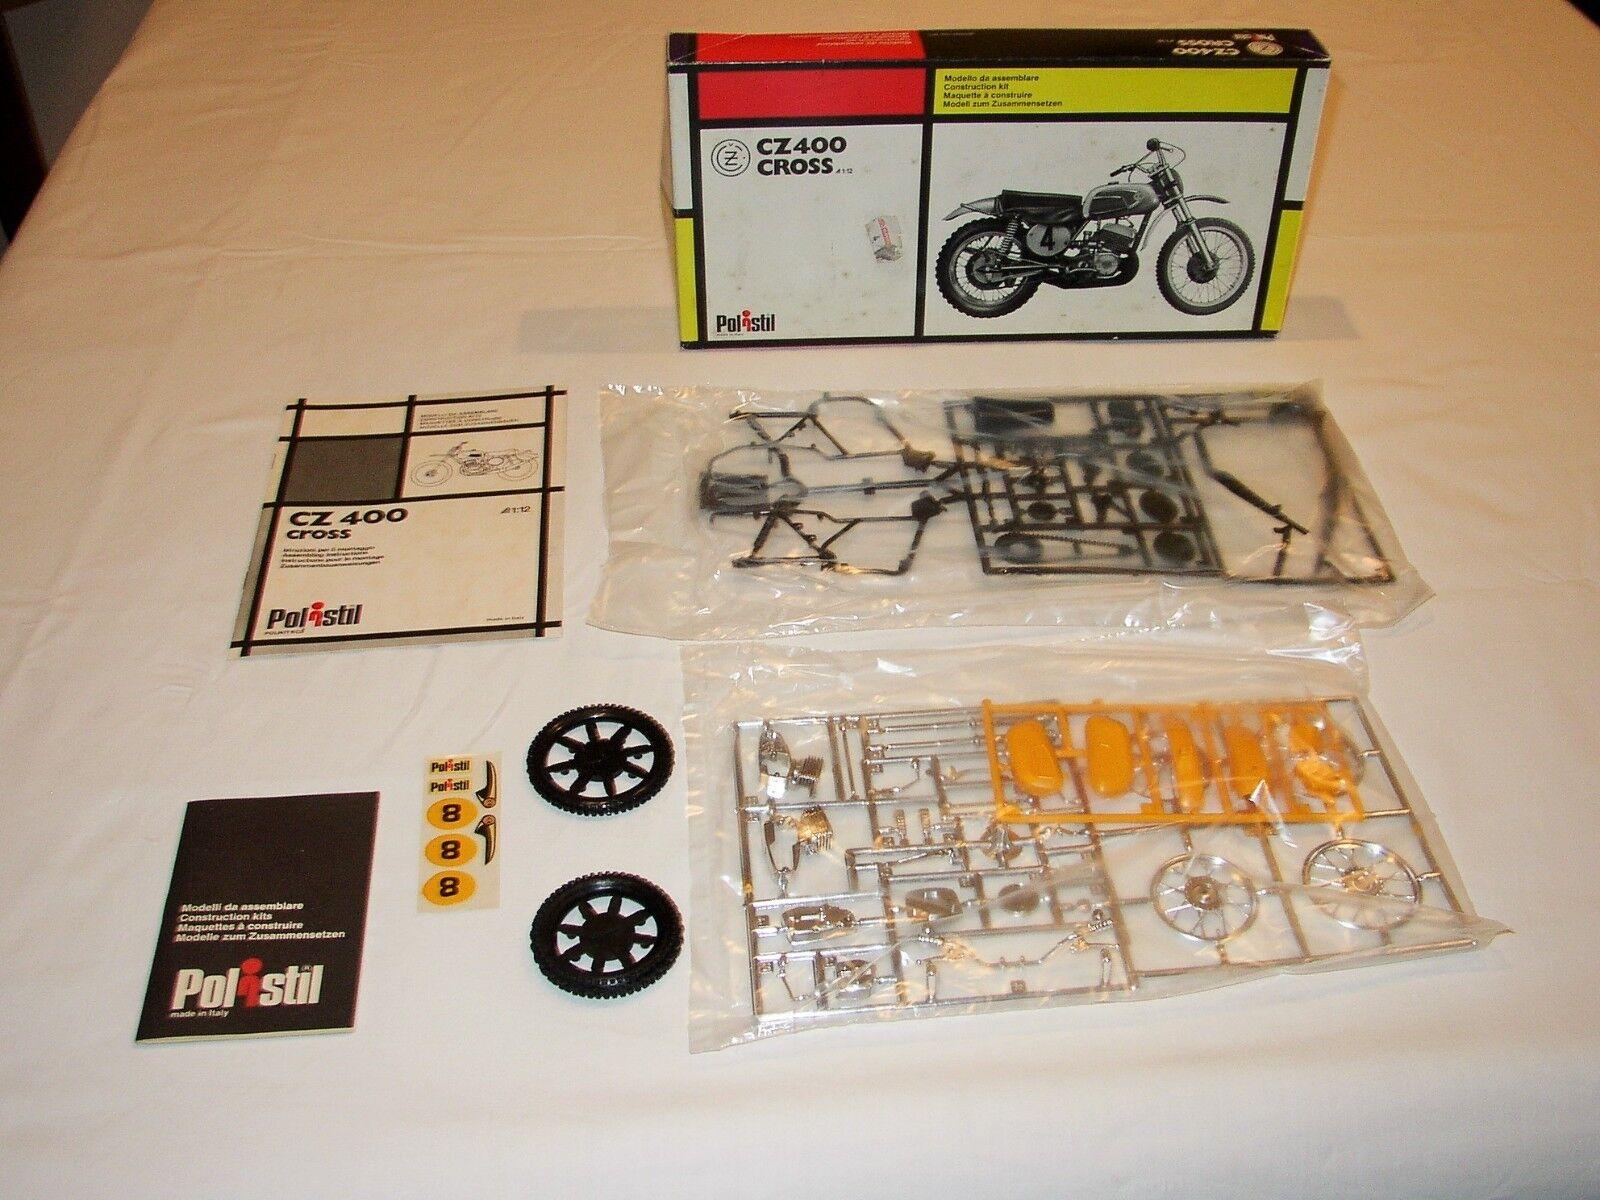 MOTO CZ 400 CROSS - POLISTIL  - 1974 - SCALA 1 12 - KIT - MINT BOX - MOLTO RARO